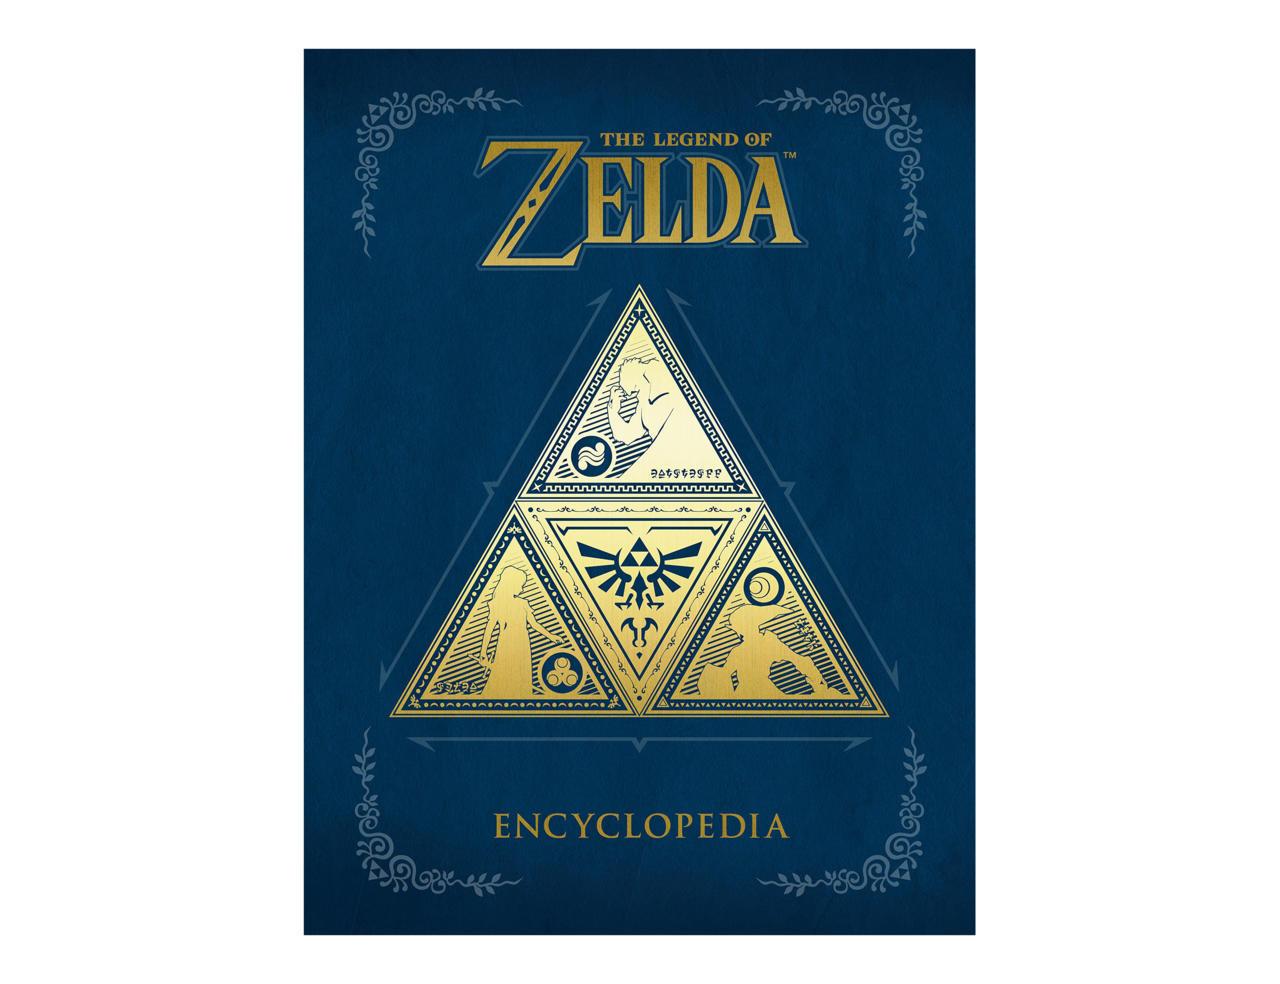 The Legend of Zelda Encylopedia